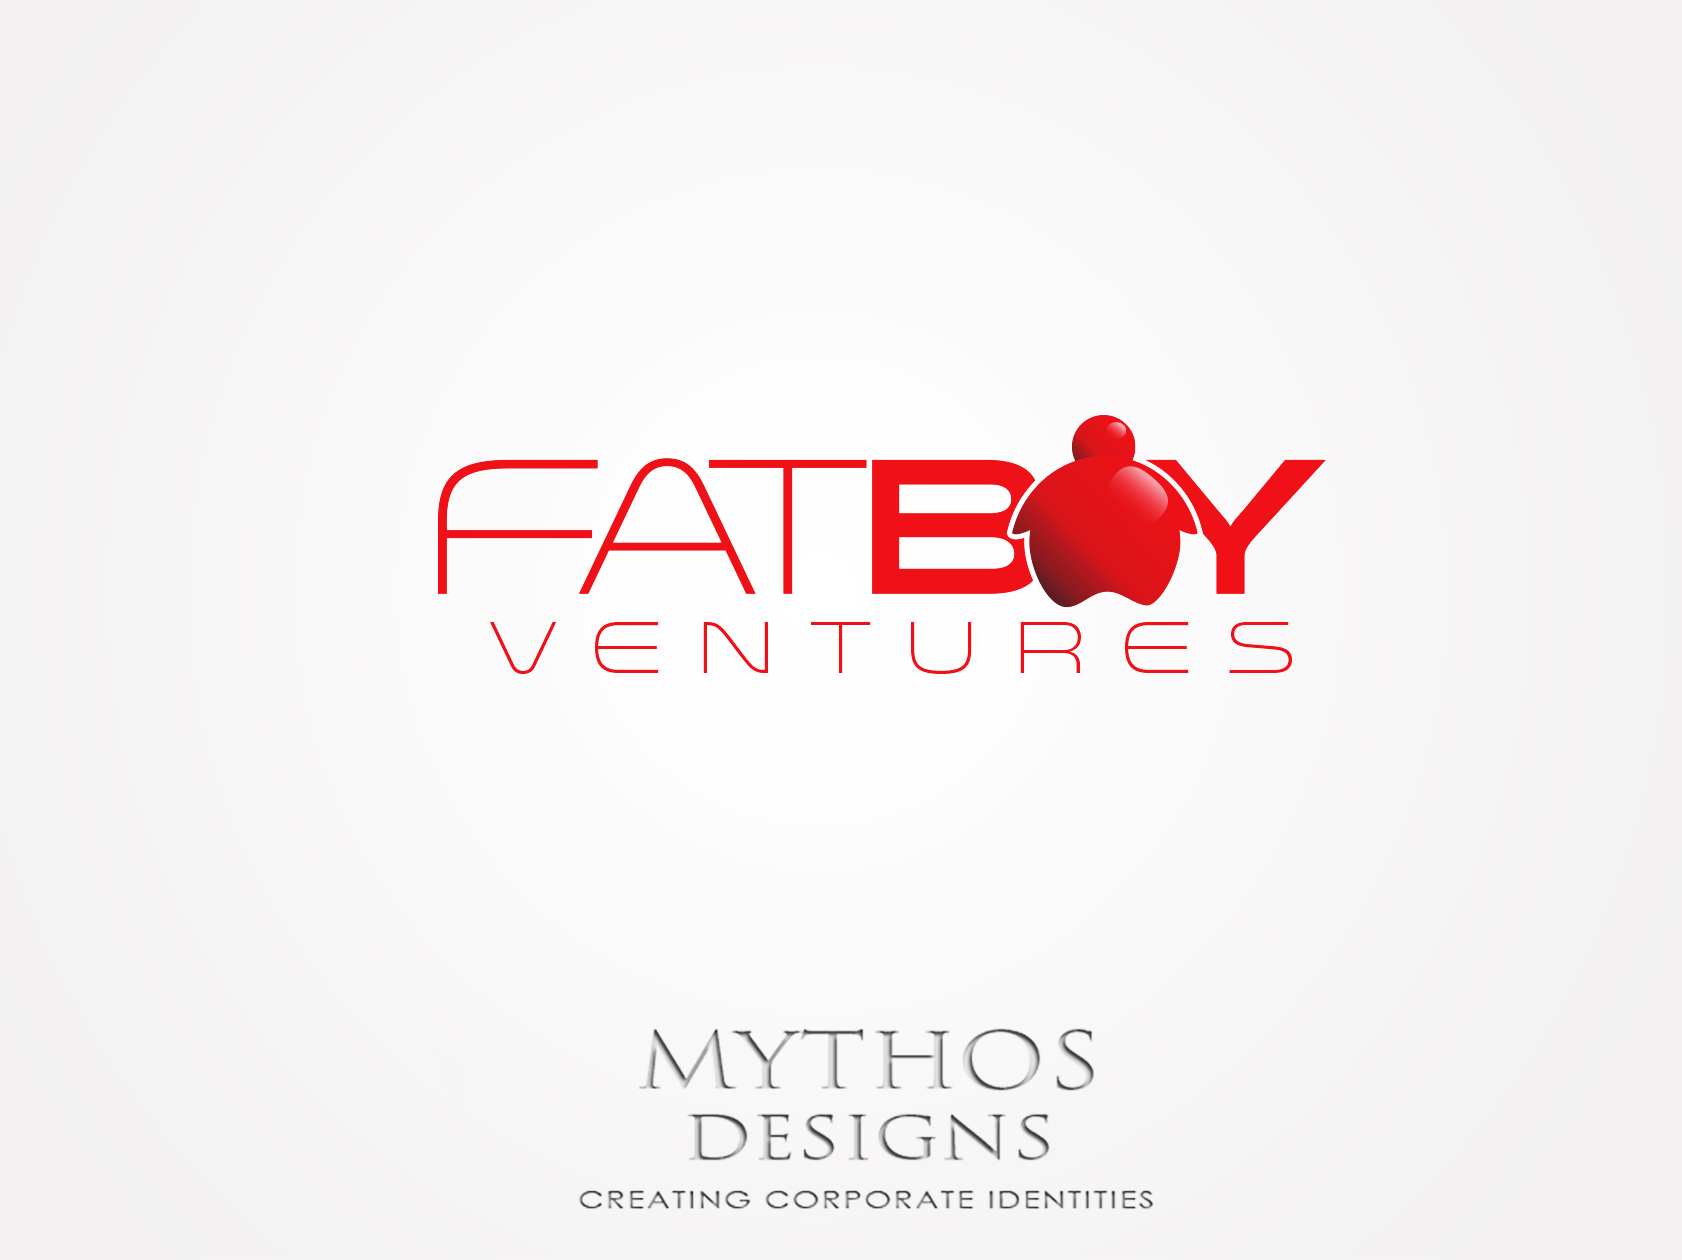 Logo Design by Mythos Designs - Entry No. 92 in the Logo Design Contest Fun Logo Design for Fat Boy Ventures.